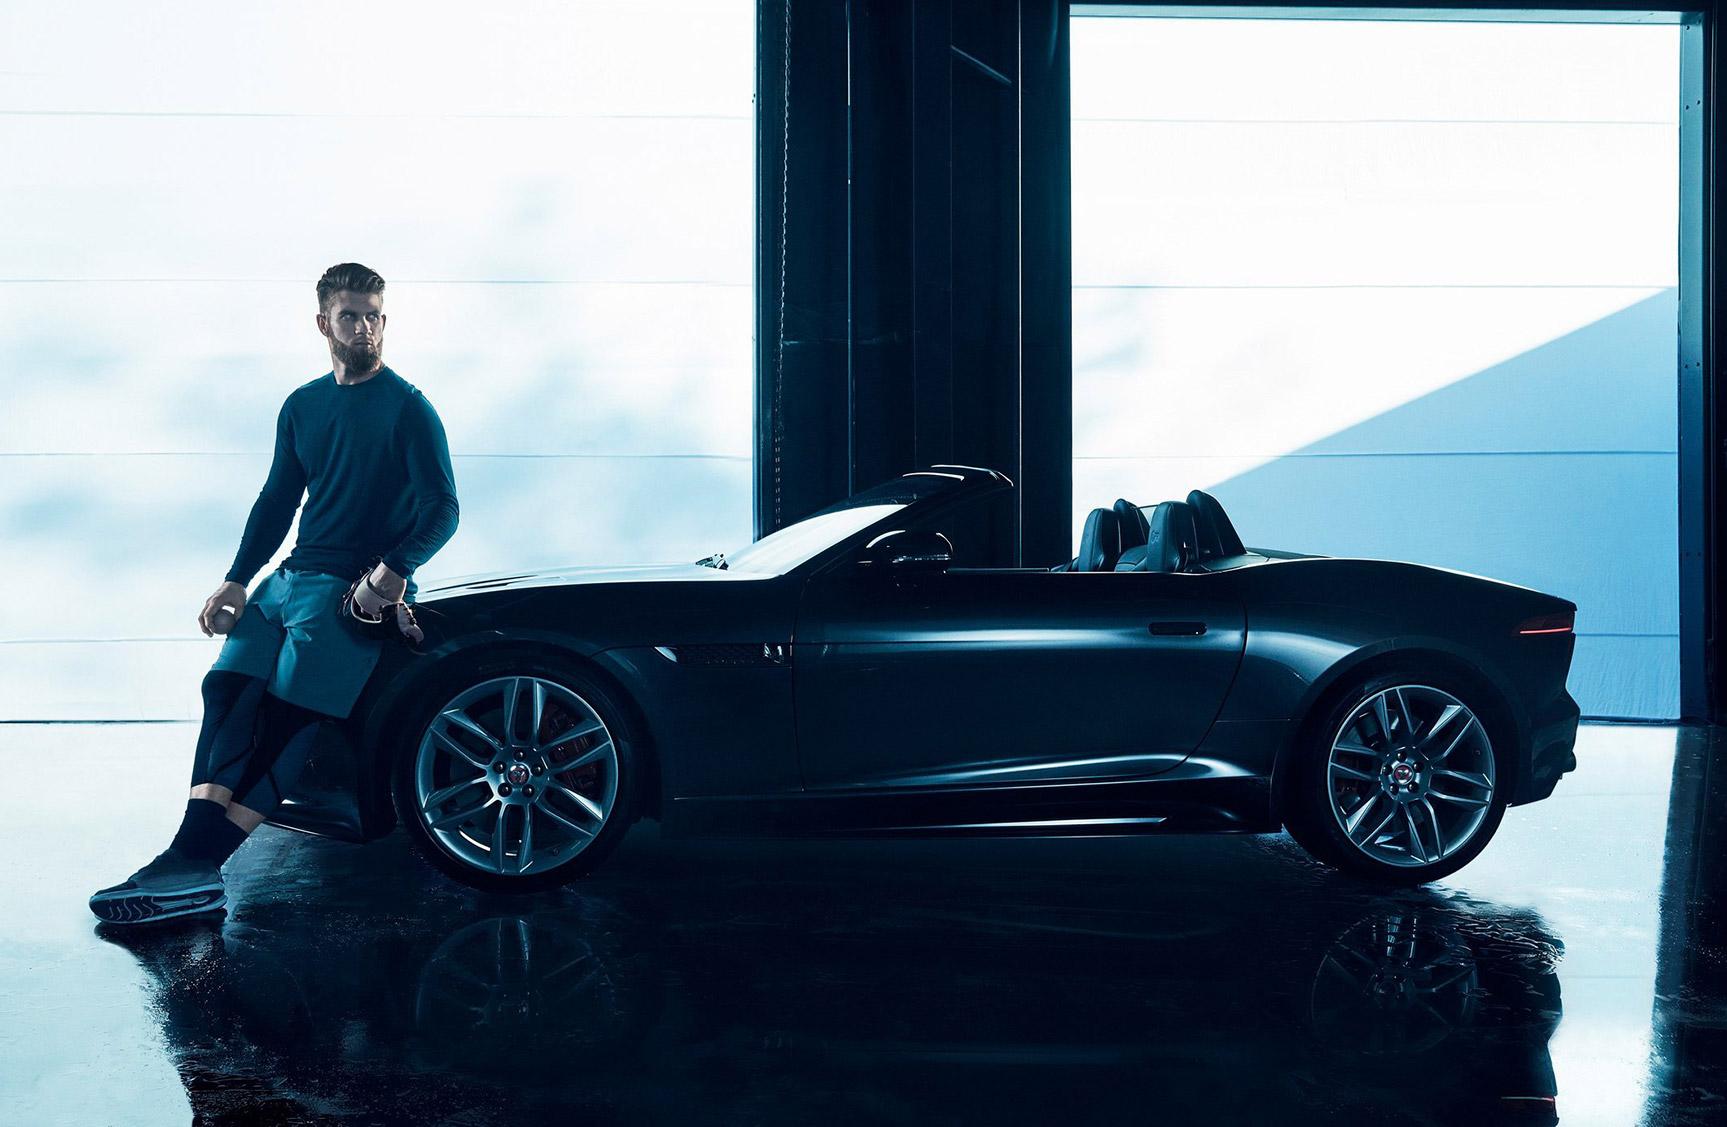 Брайс Харпер / Bryce Harper by Kai Regan – Jaguar F-type 2017